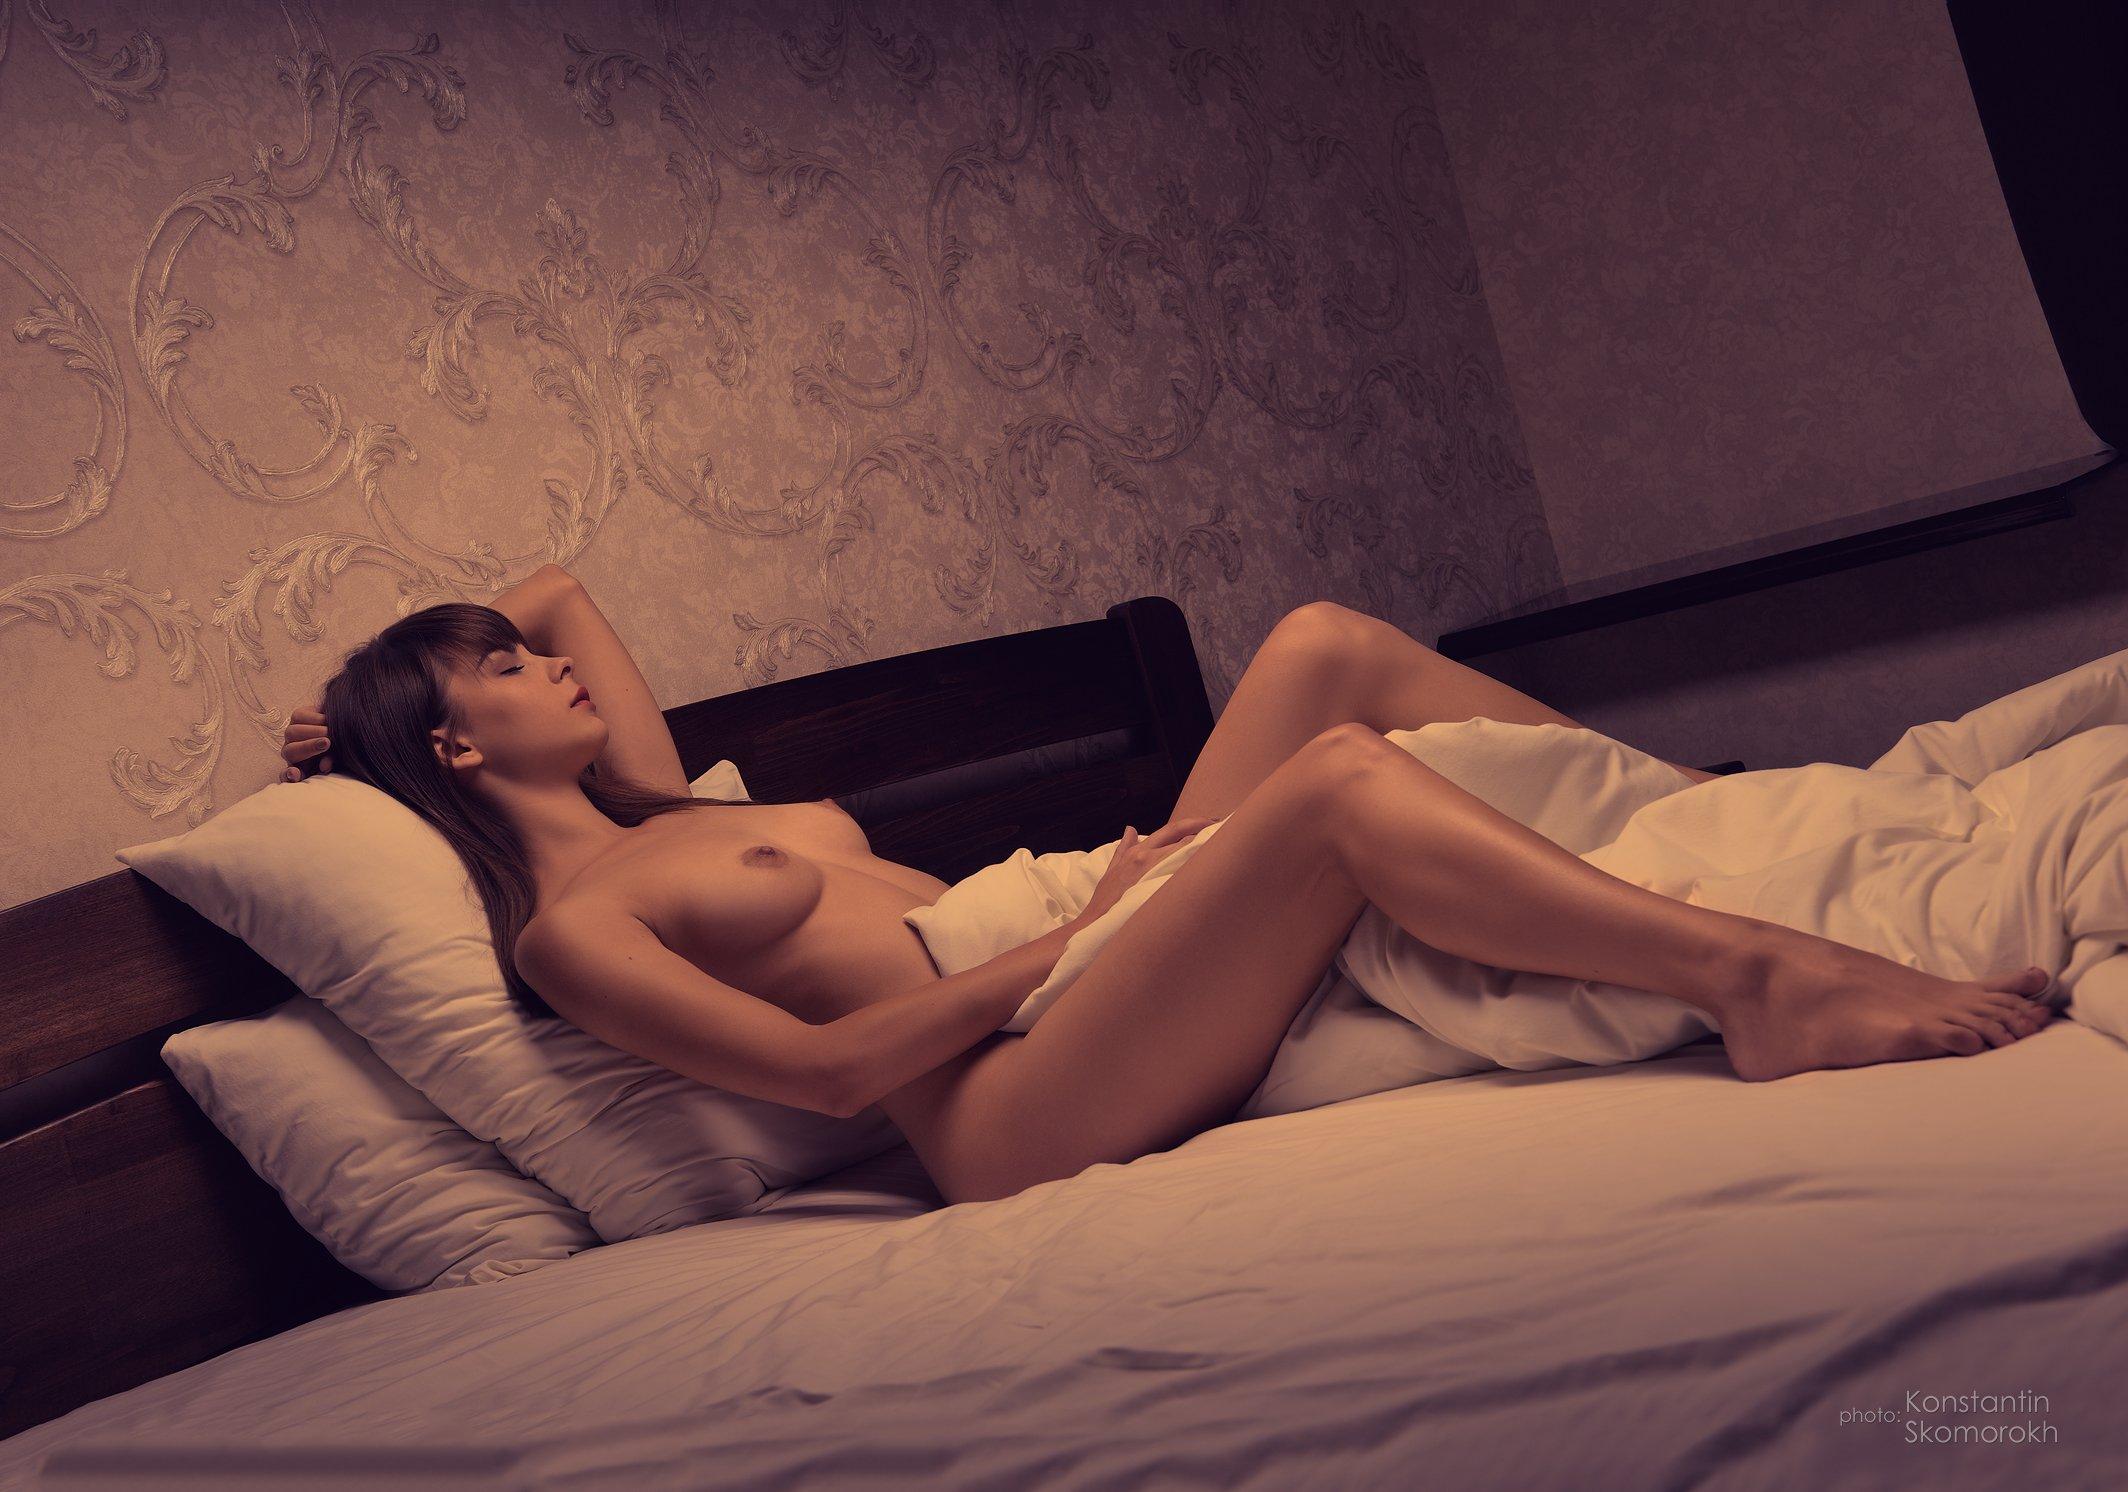 konstantin skomorokh, константин скоморох, kiev, киев, severodonetsk, северодонецк, ню, art nude, fine art, ukraine, Константин Скоморох